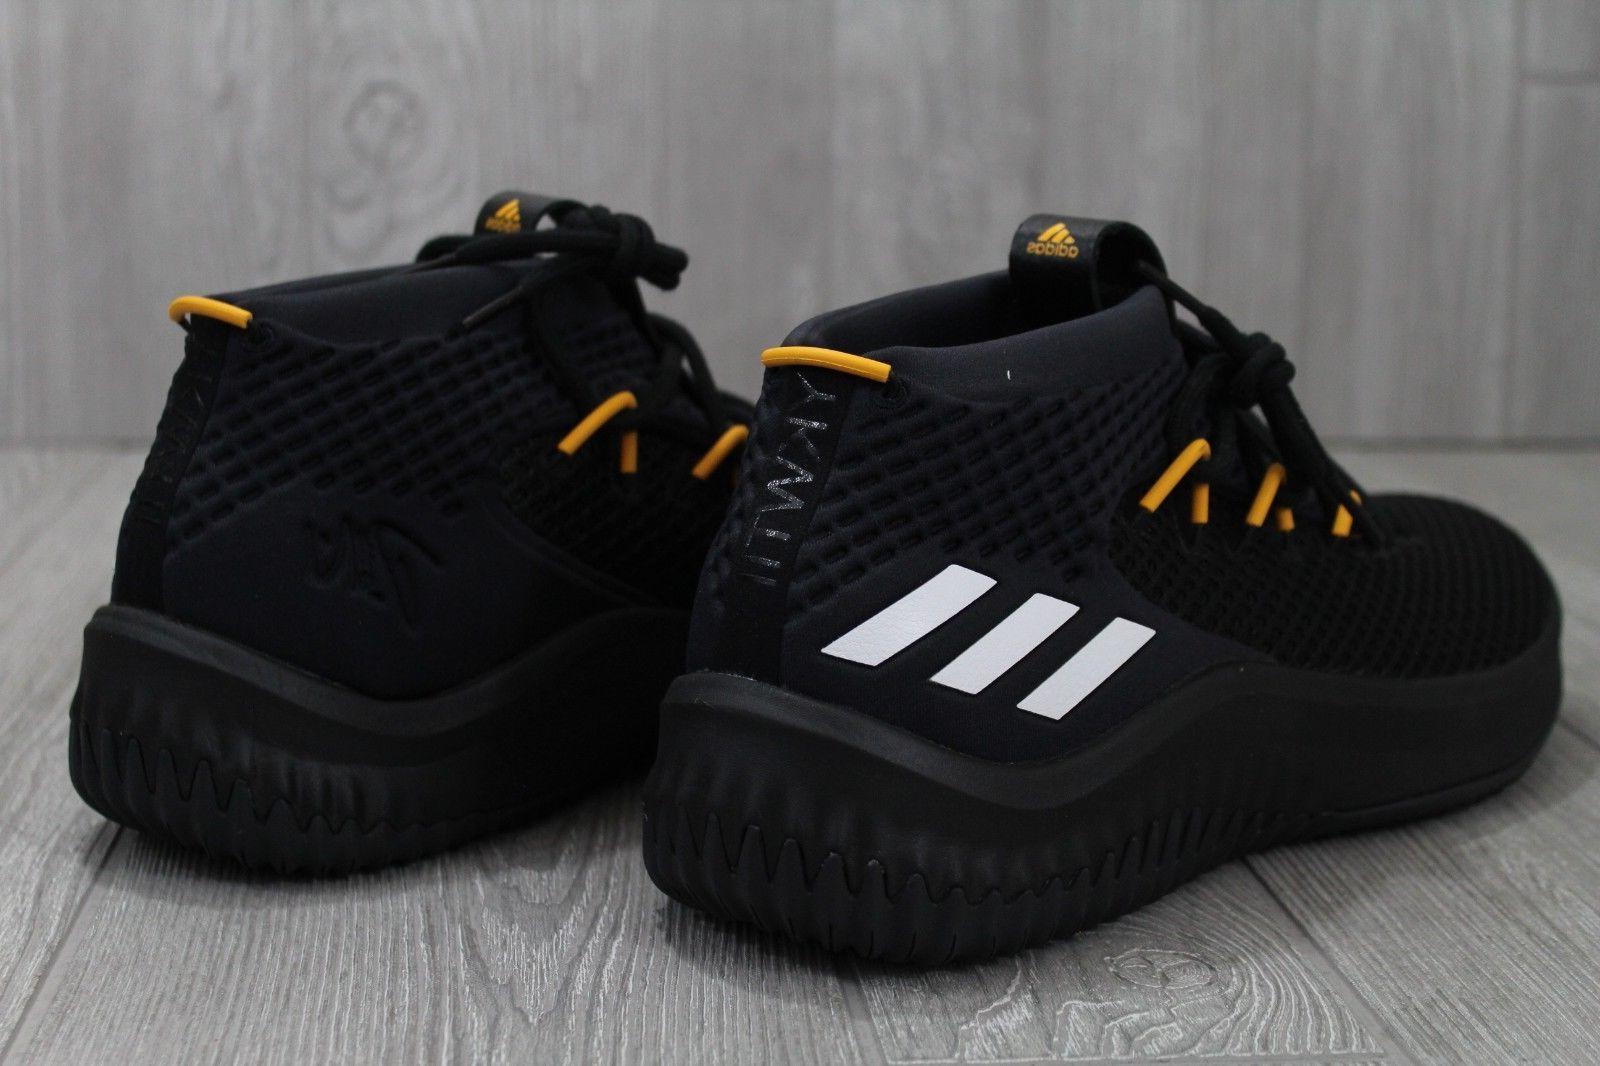 32 Adidas Black Yellow Lakers Basketball 12.5 13 14